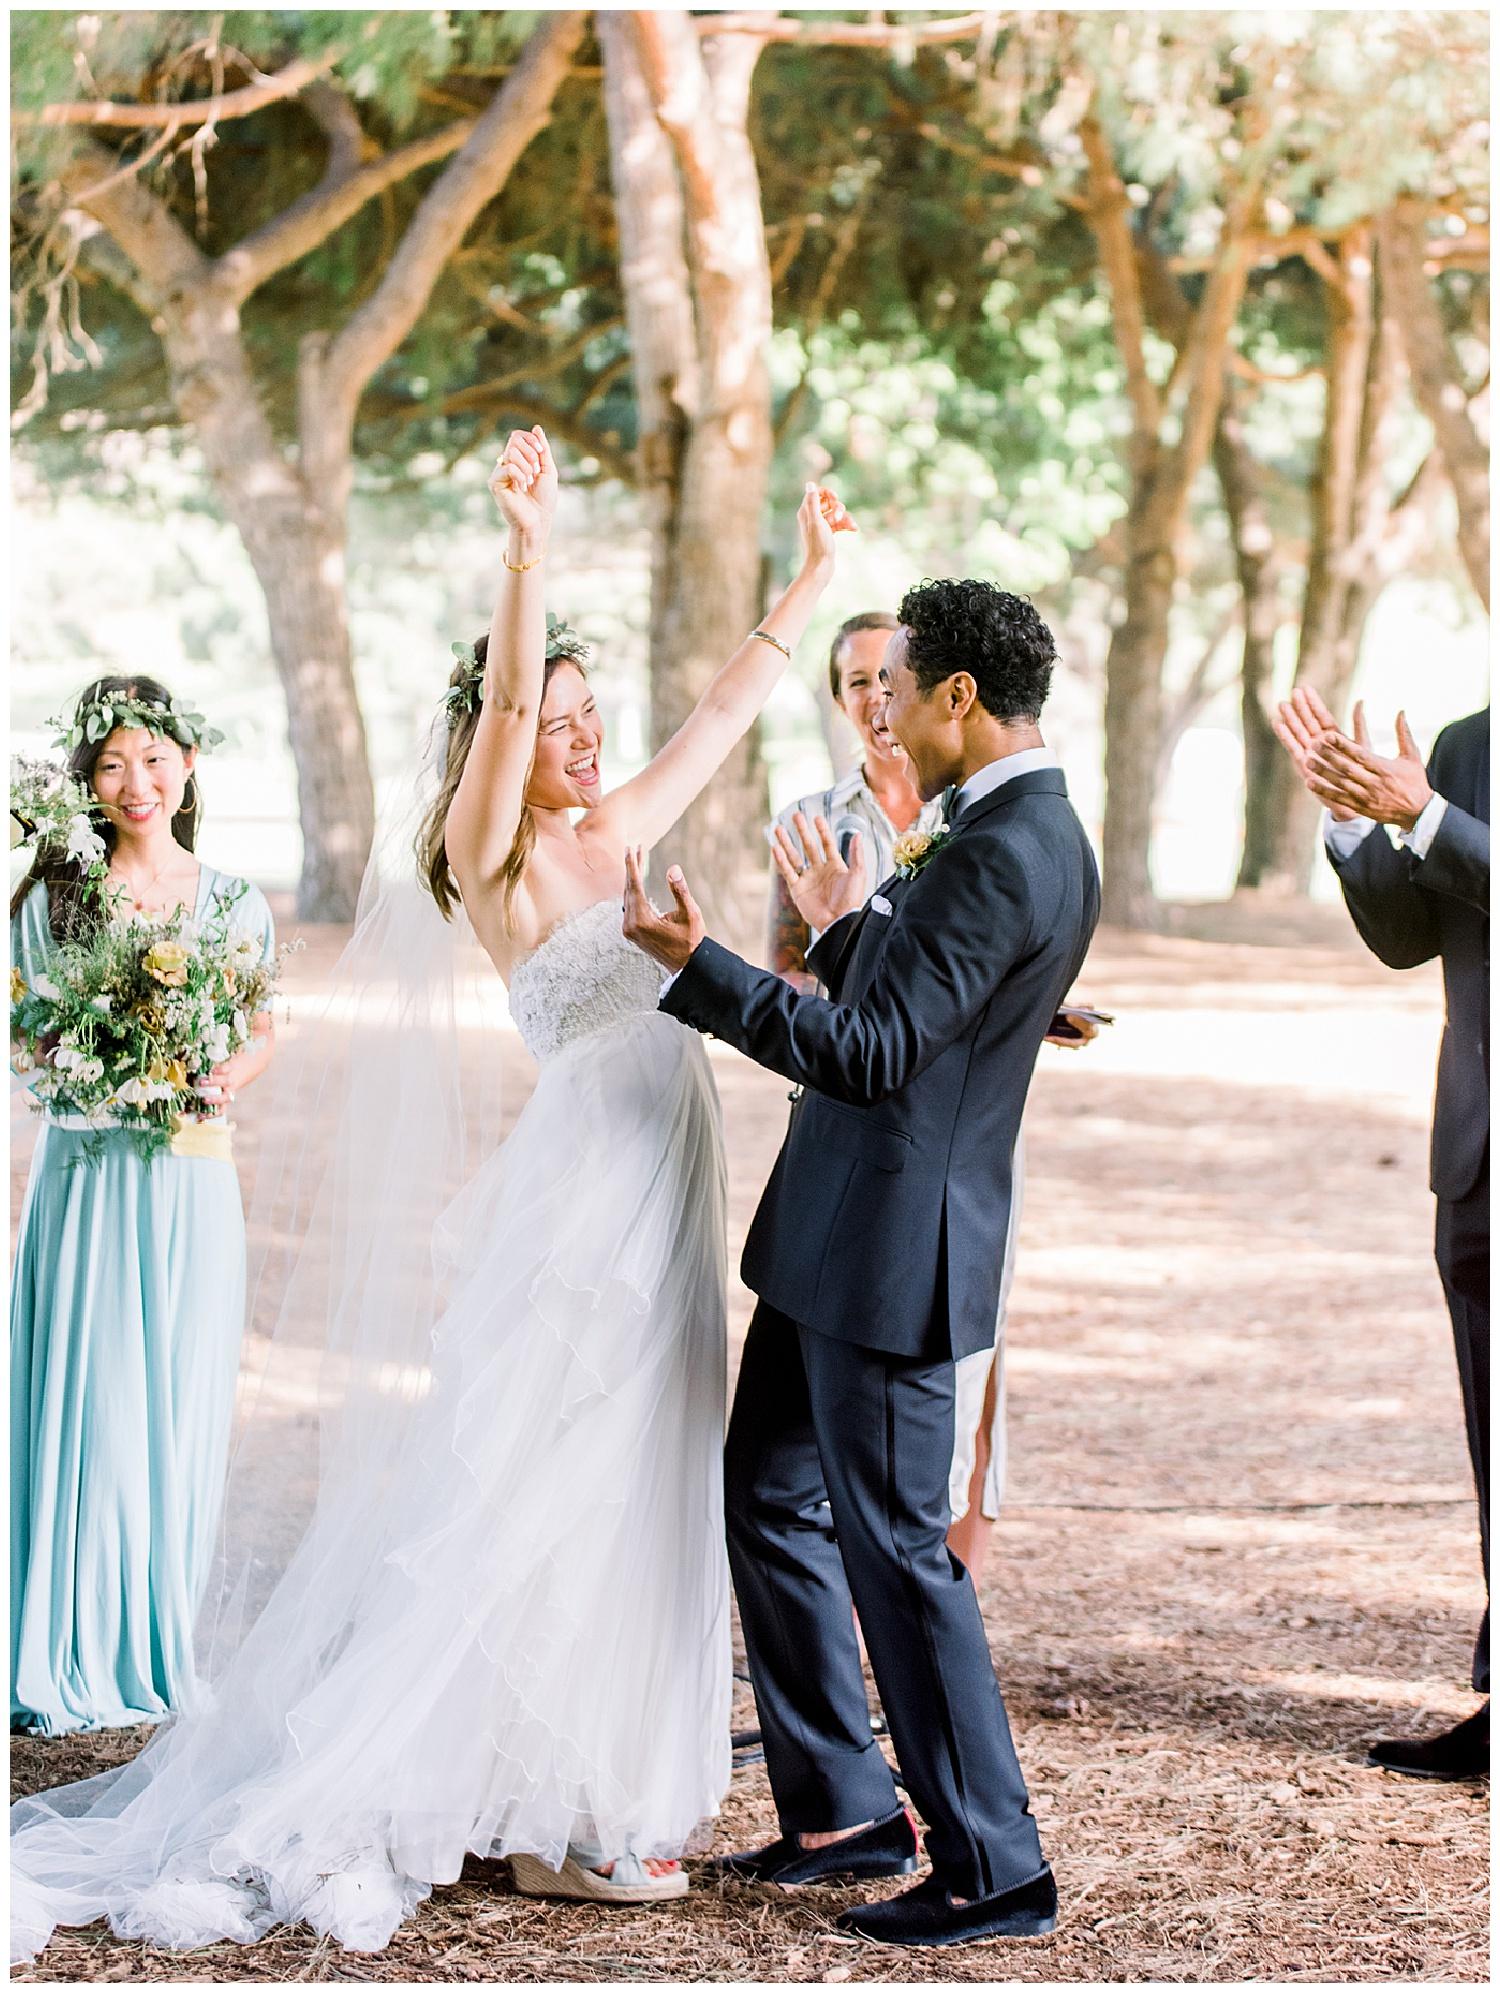 Janine_Licare_Photography_San_Francisco_Wedding_Photographer_0101.jpg